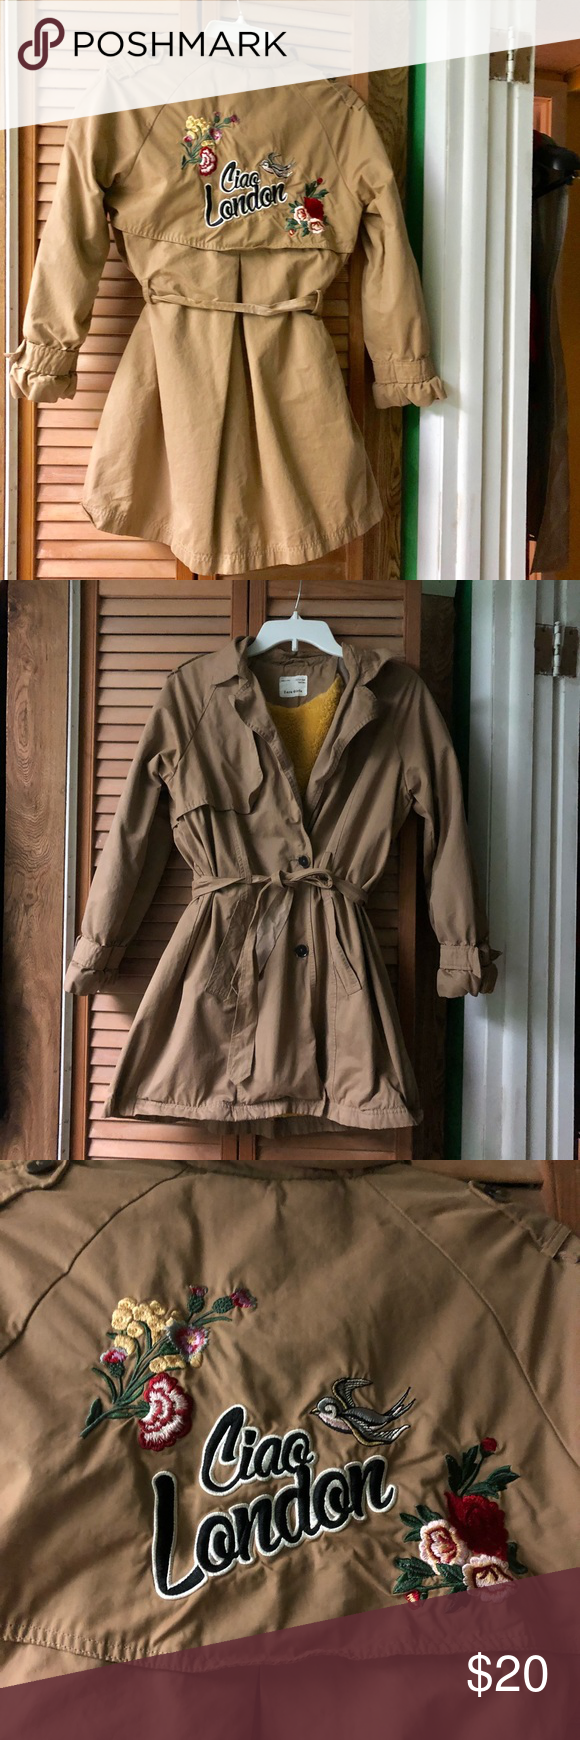 73a43cfdf54f Zara girls trench coat size 13 14 petite xs